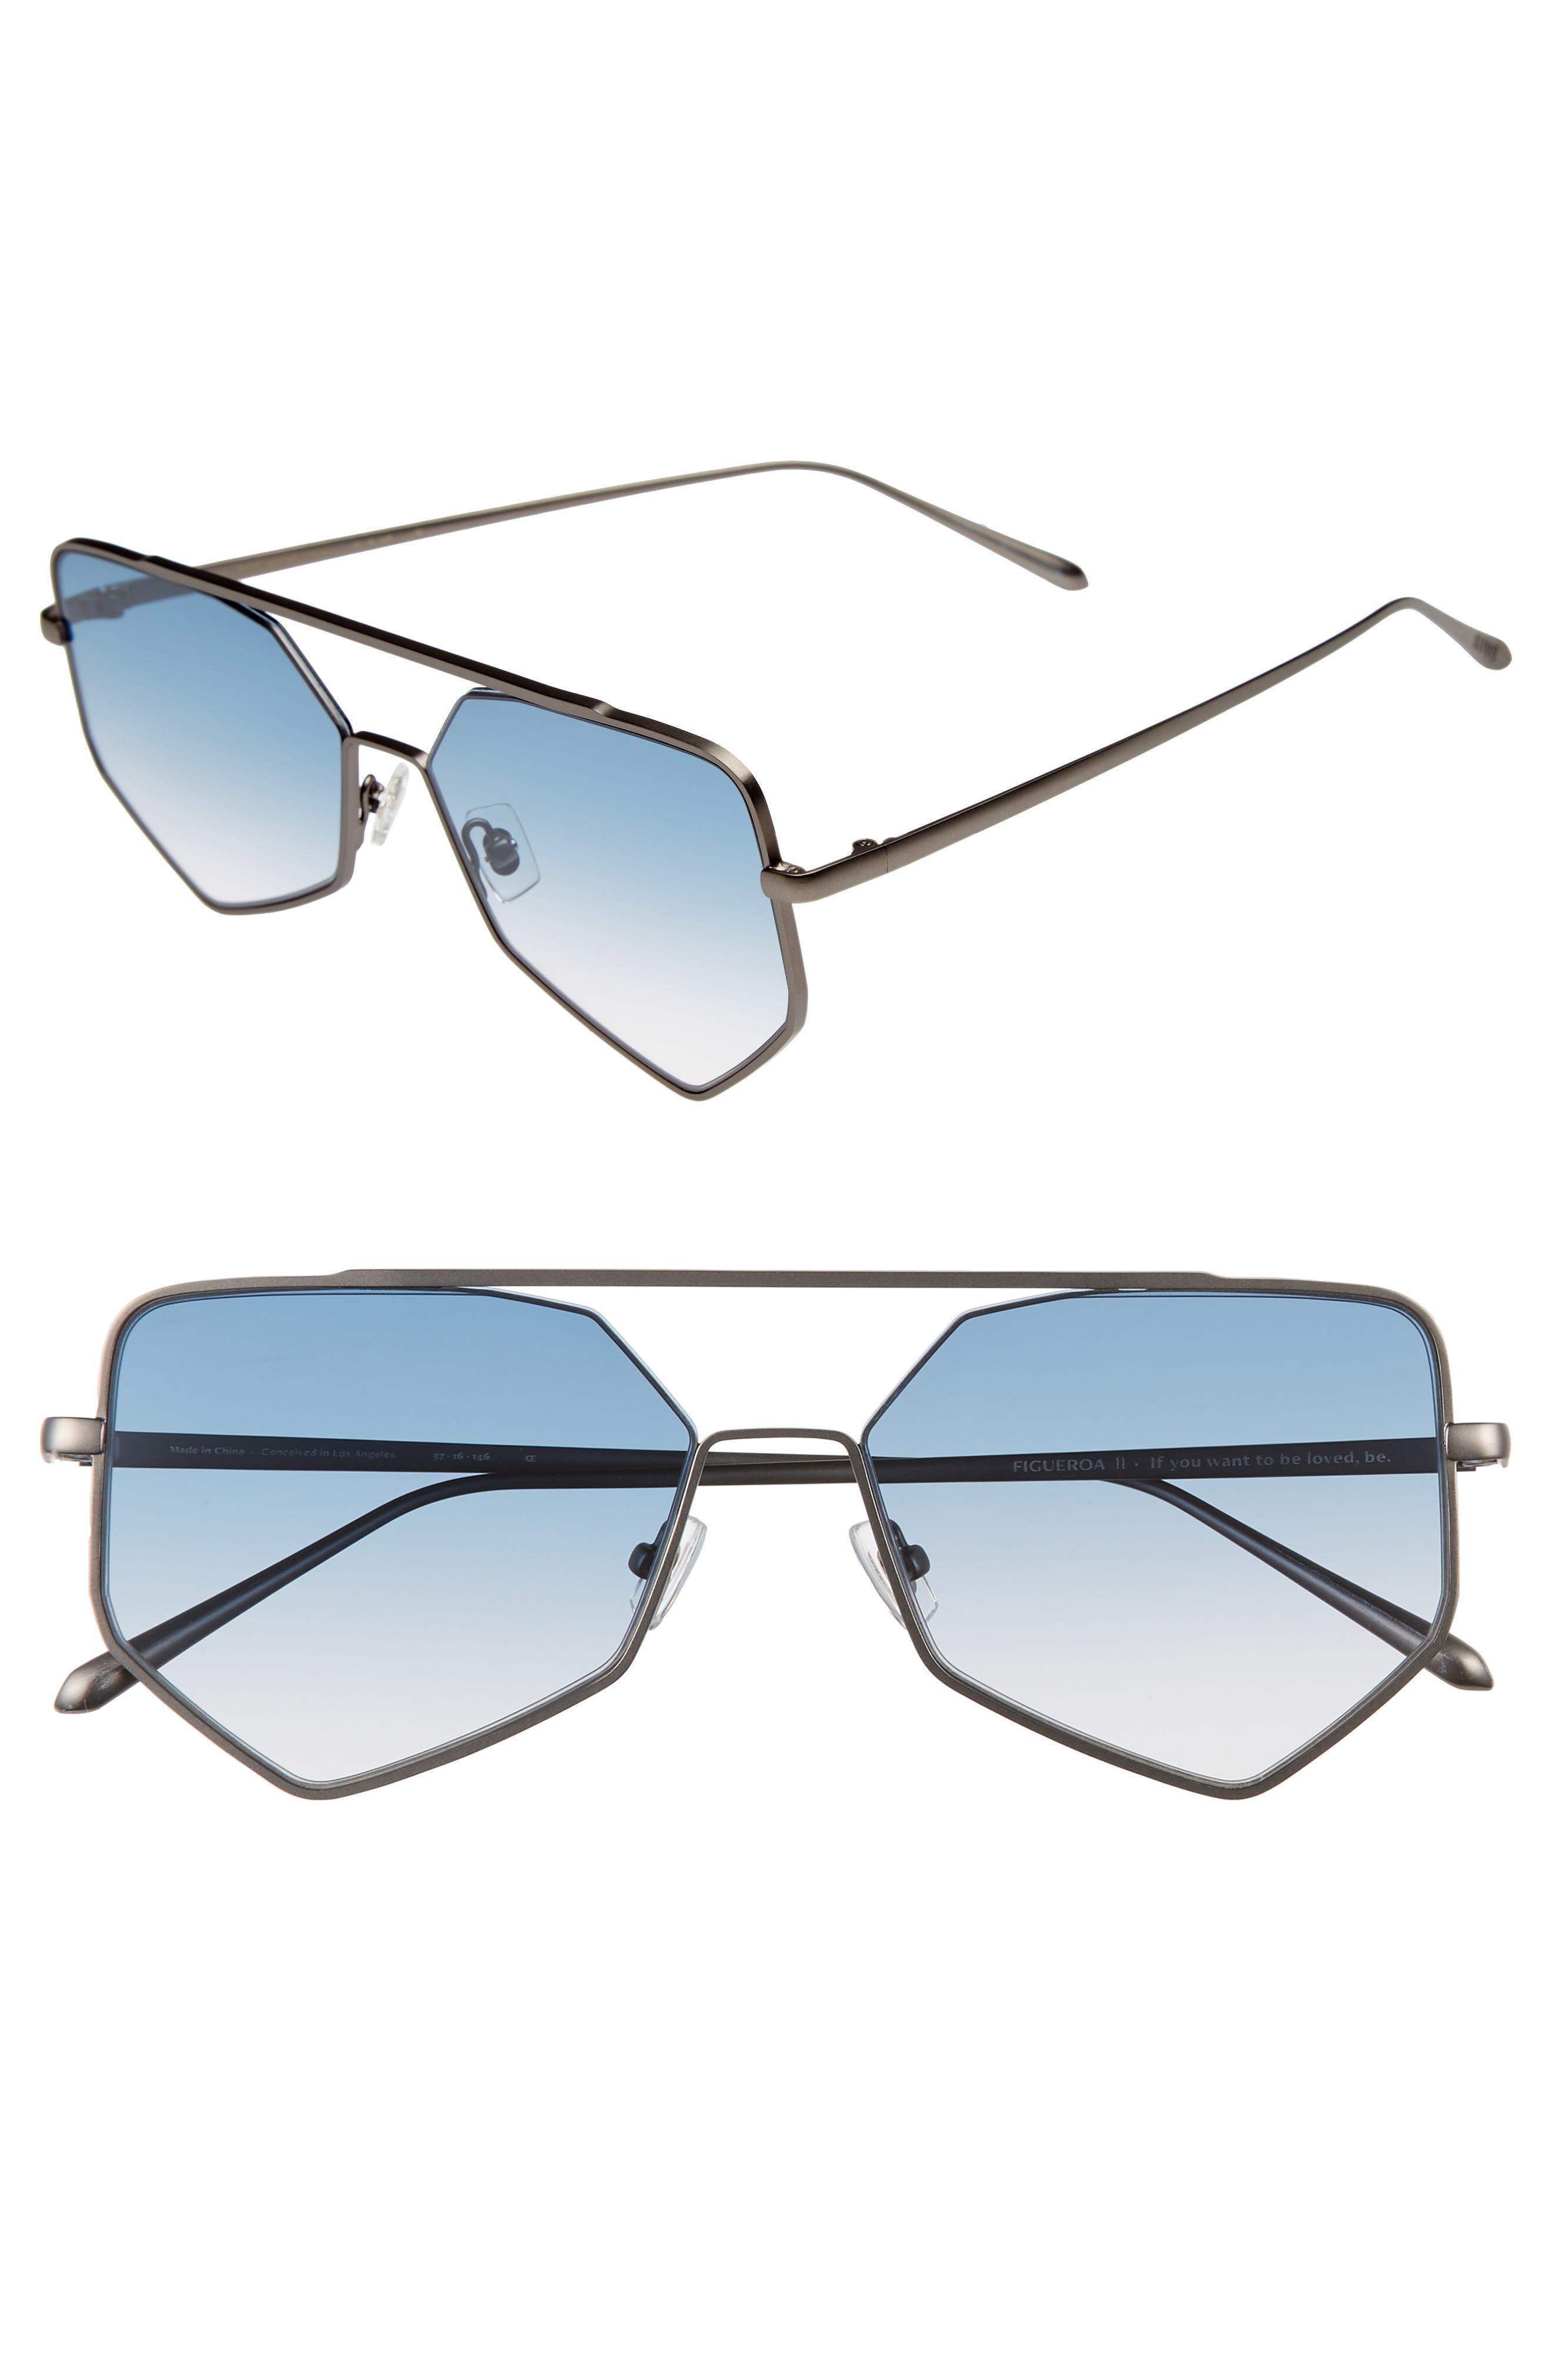 Bonnie Clyde Figueroa Ii 57Mm Aviator Sunglasses - Blue Gradient